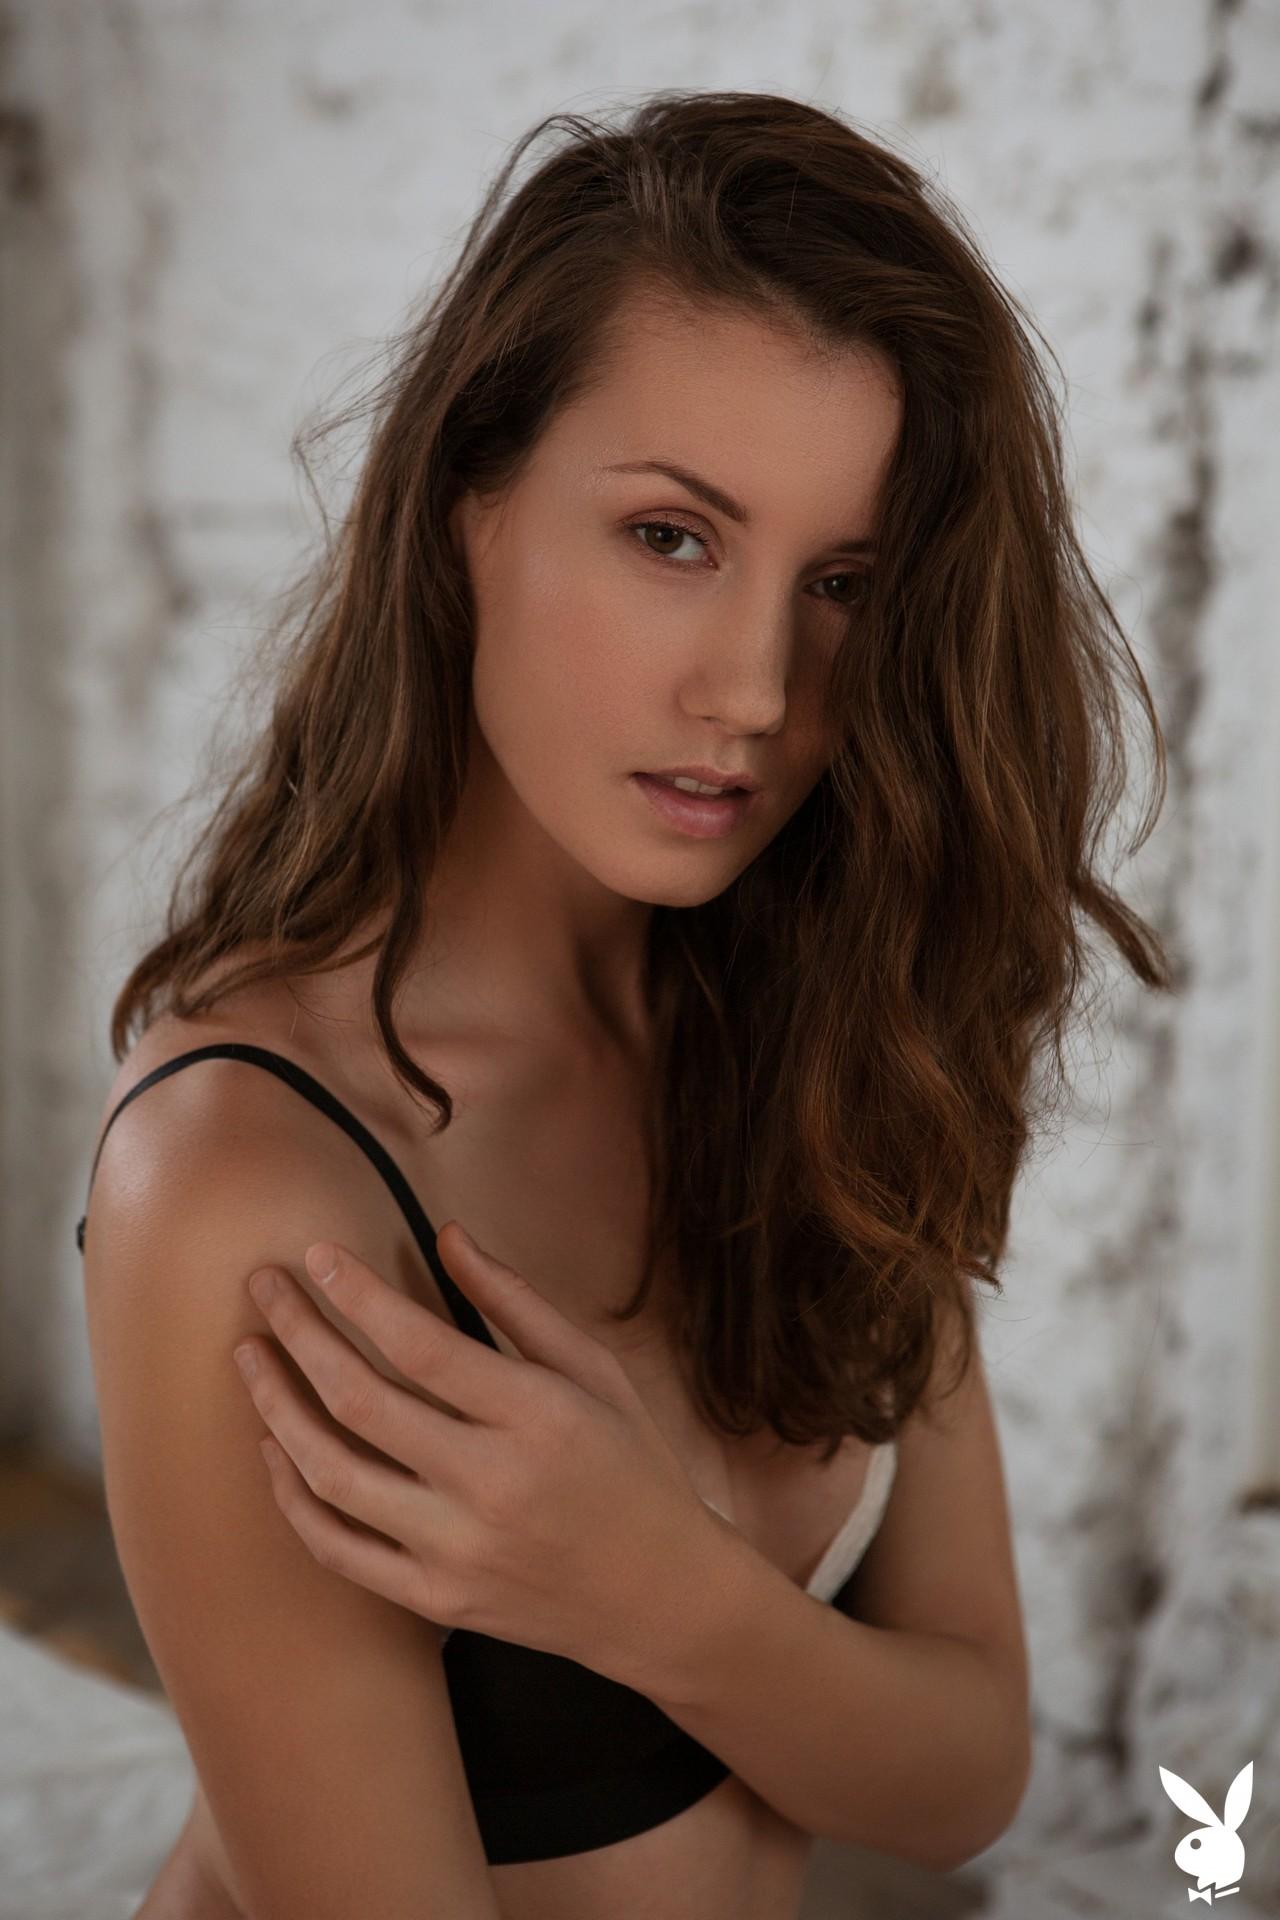 Mikaela Mckenna In Early Awakening Playboy Plus (2)